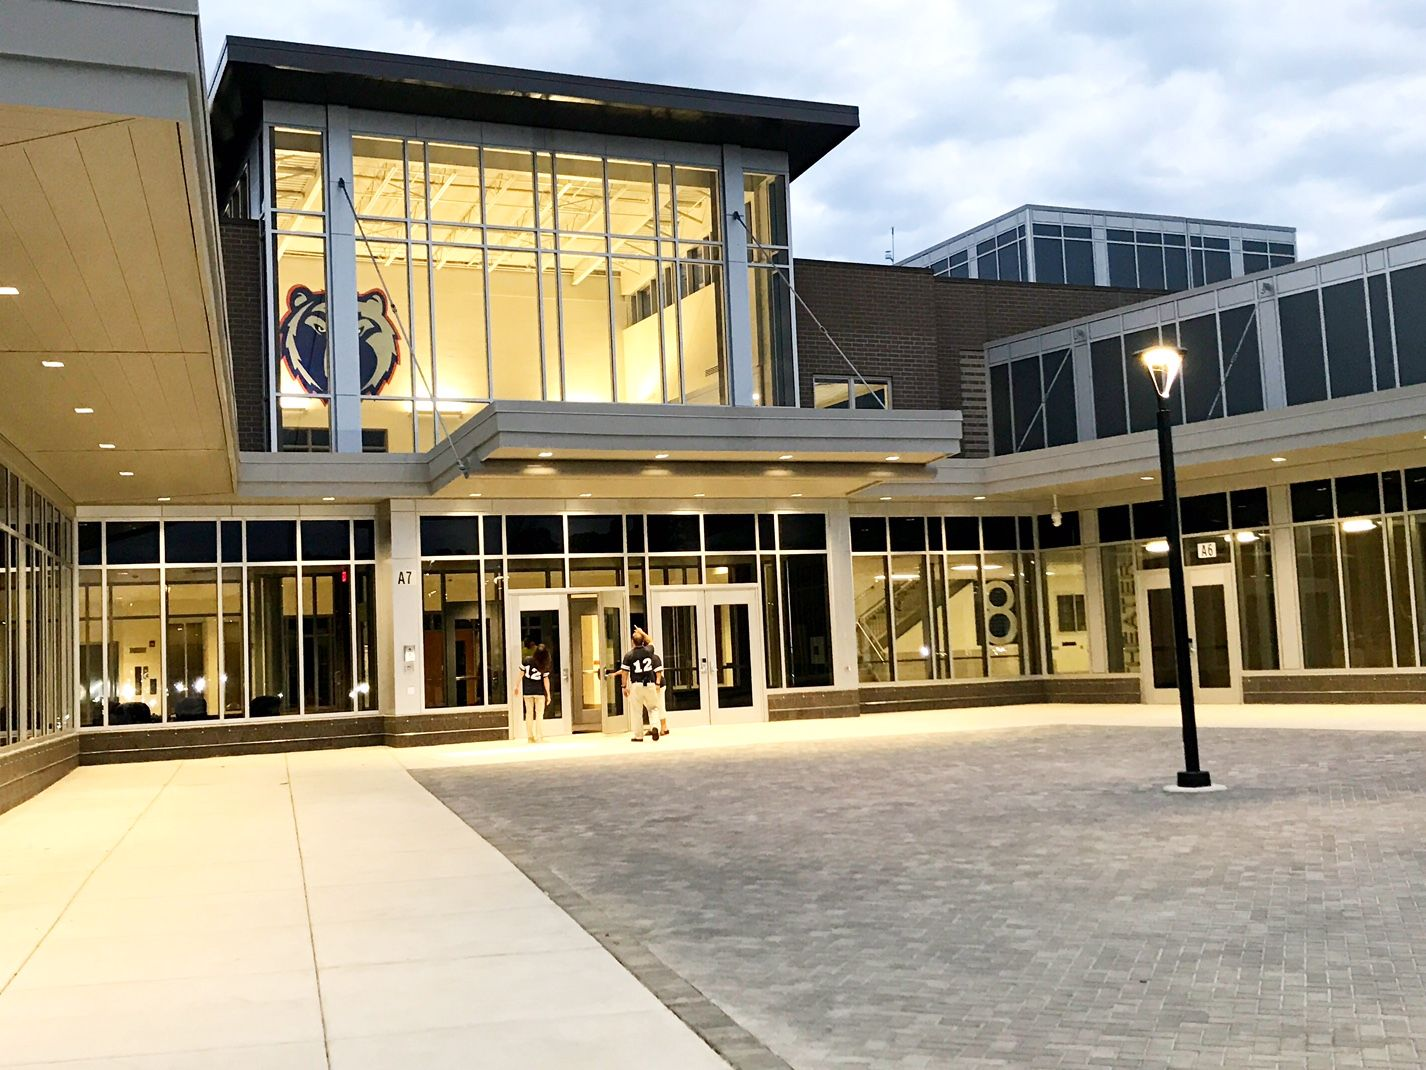 Brambleton Middle School is one of Loudoun County's new schools. (WTOP/Neal Augenstein)